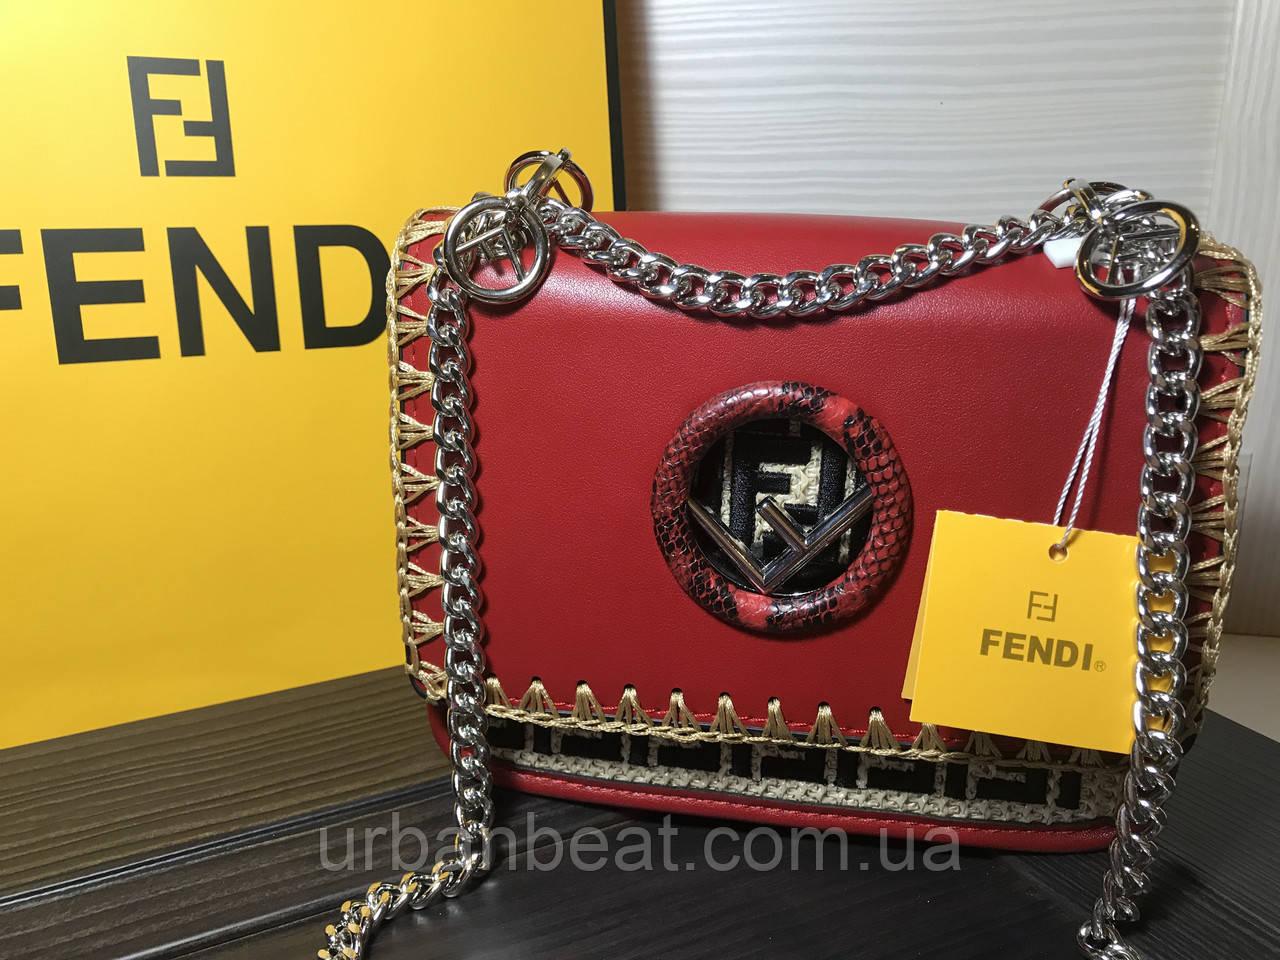 4391d63a97b2 Женская мини сумка Фенди Kan1 на цепочке Red (Реплика): продажа ...